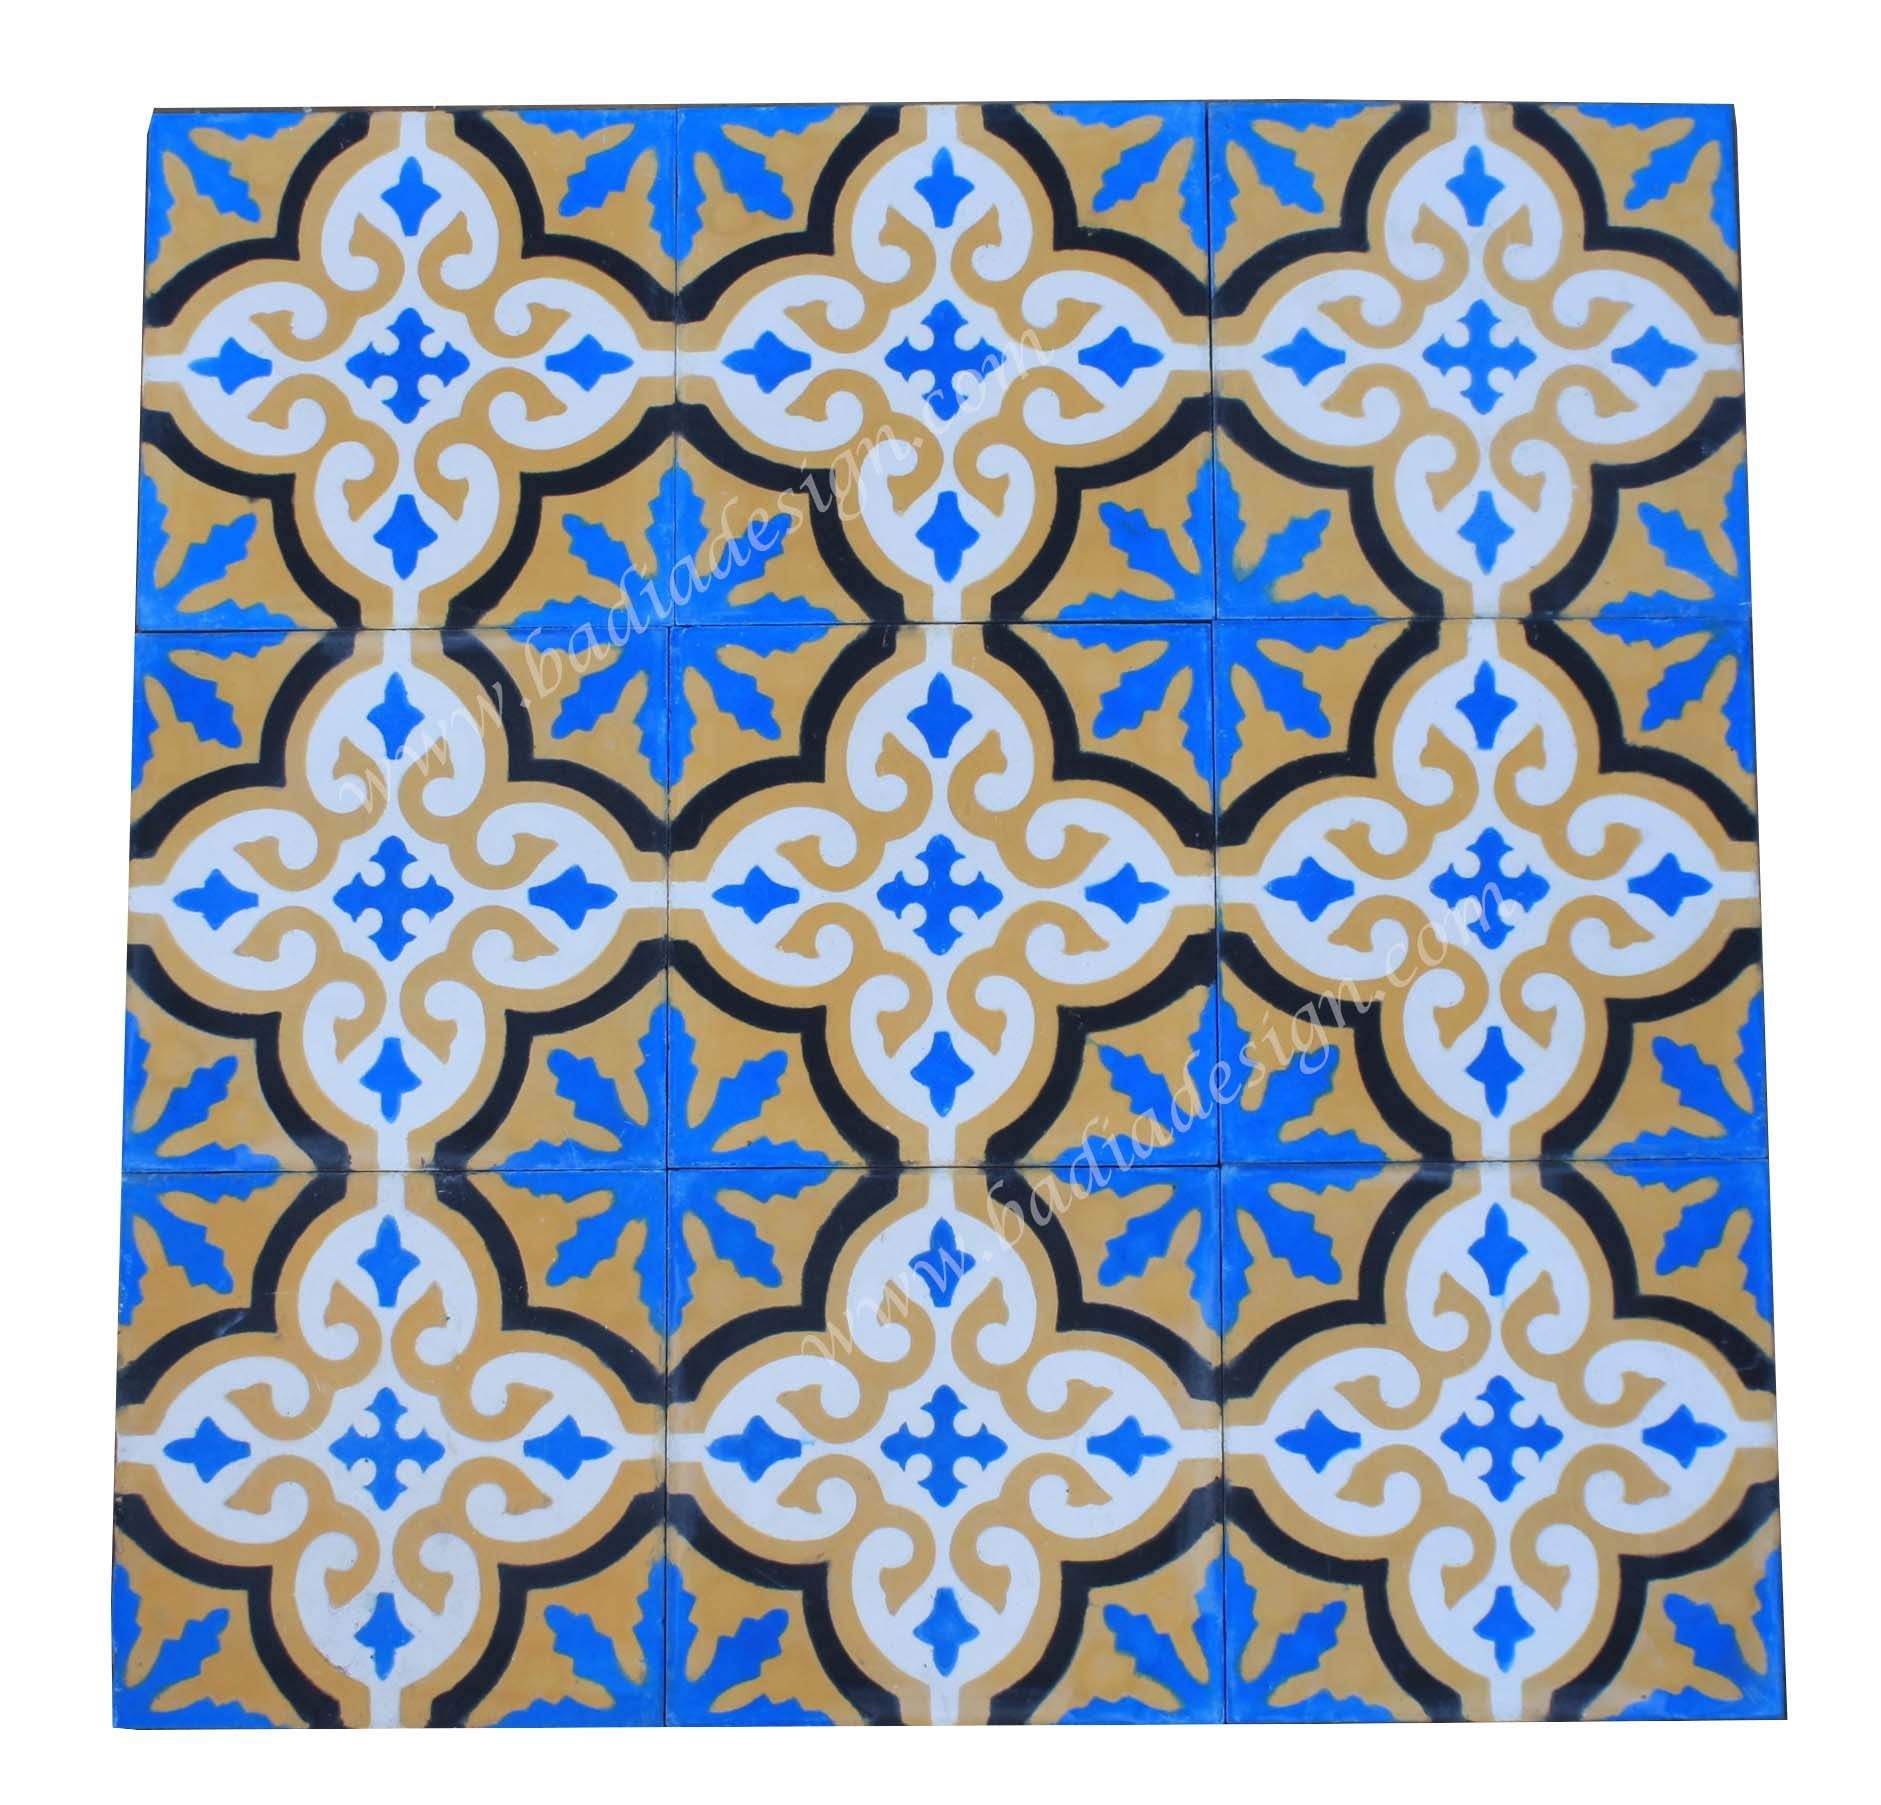 portugues-style-floor-tile-ct086-1.jpg